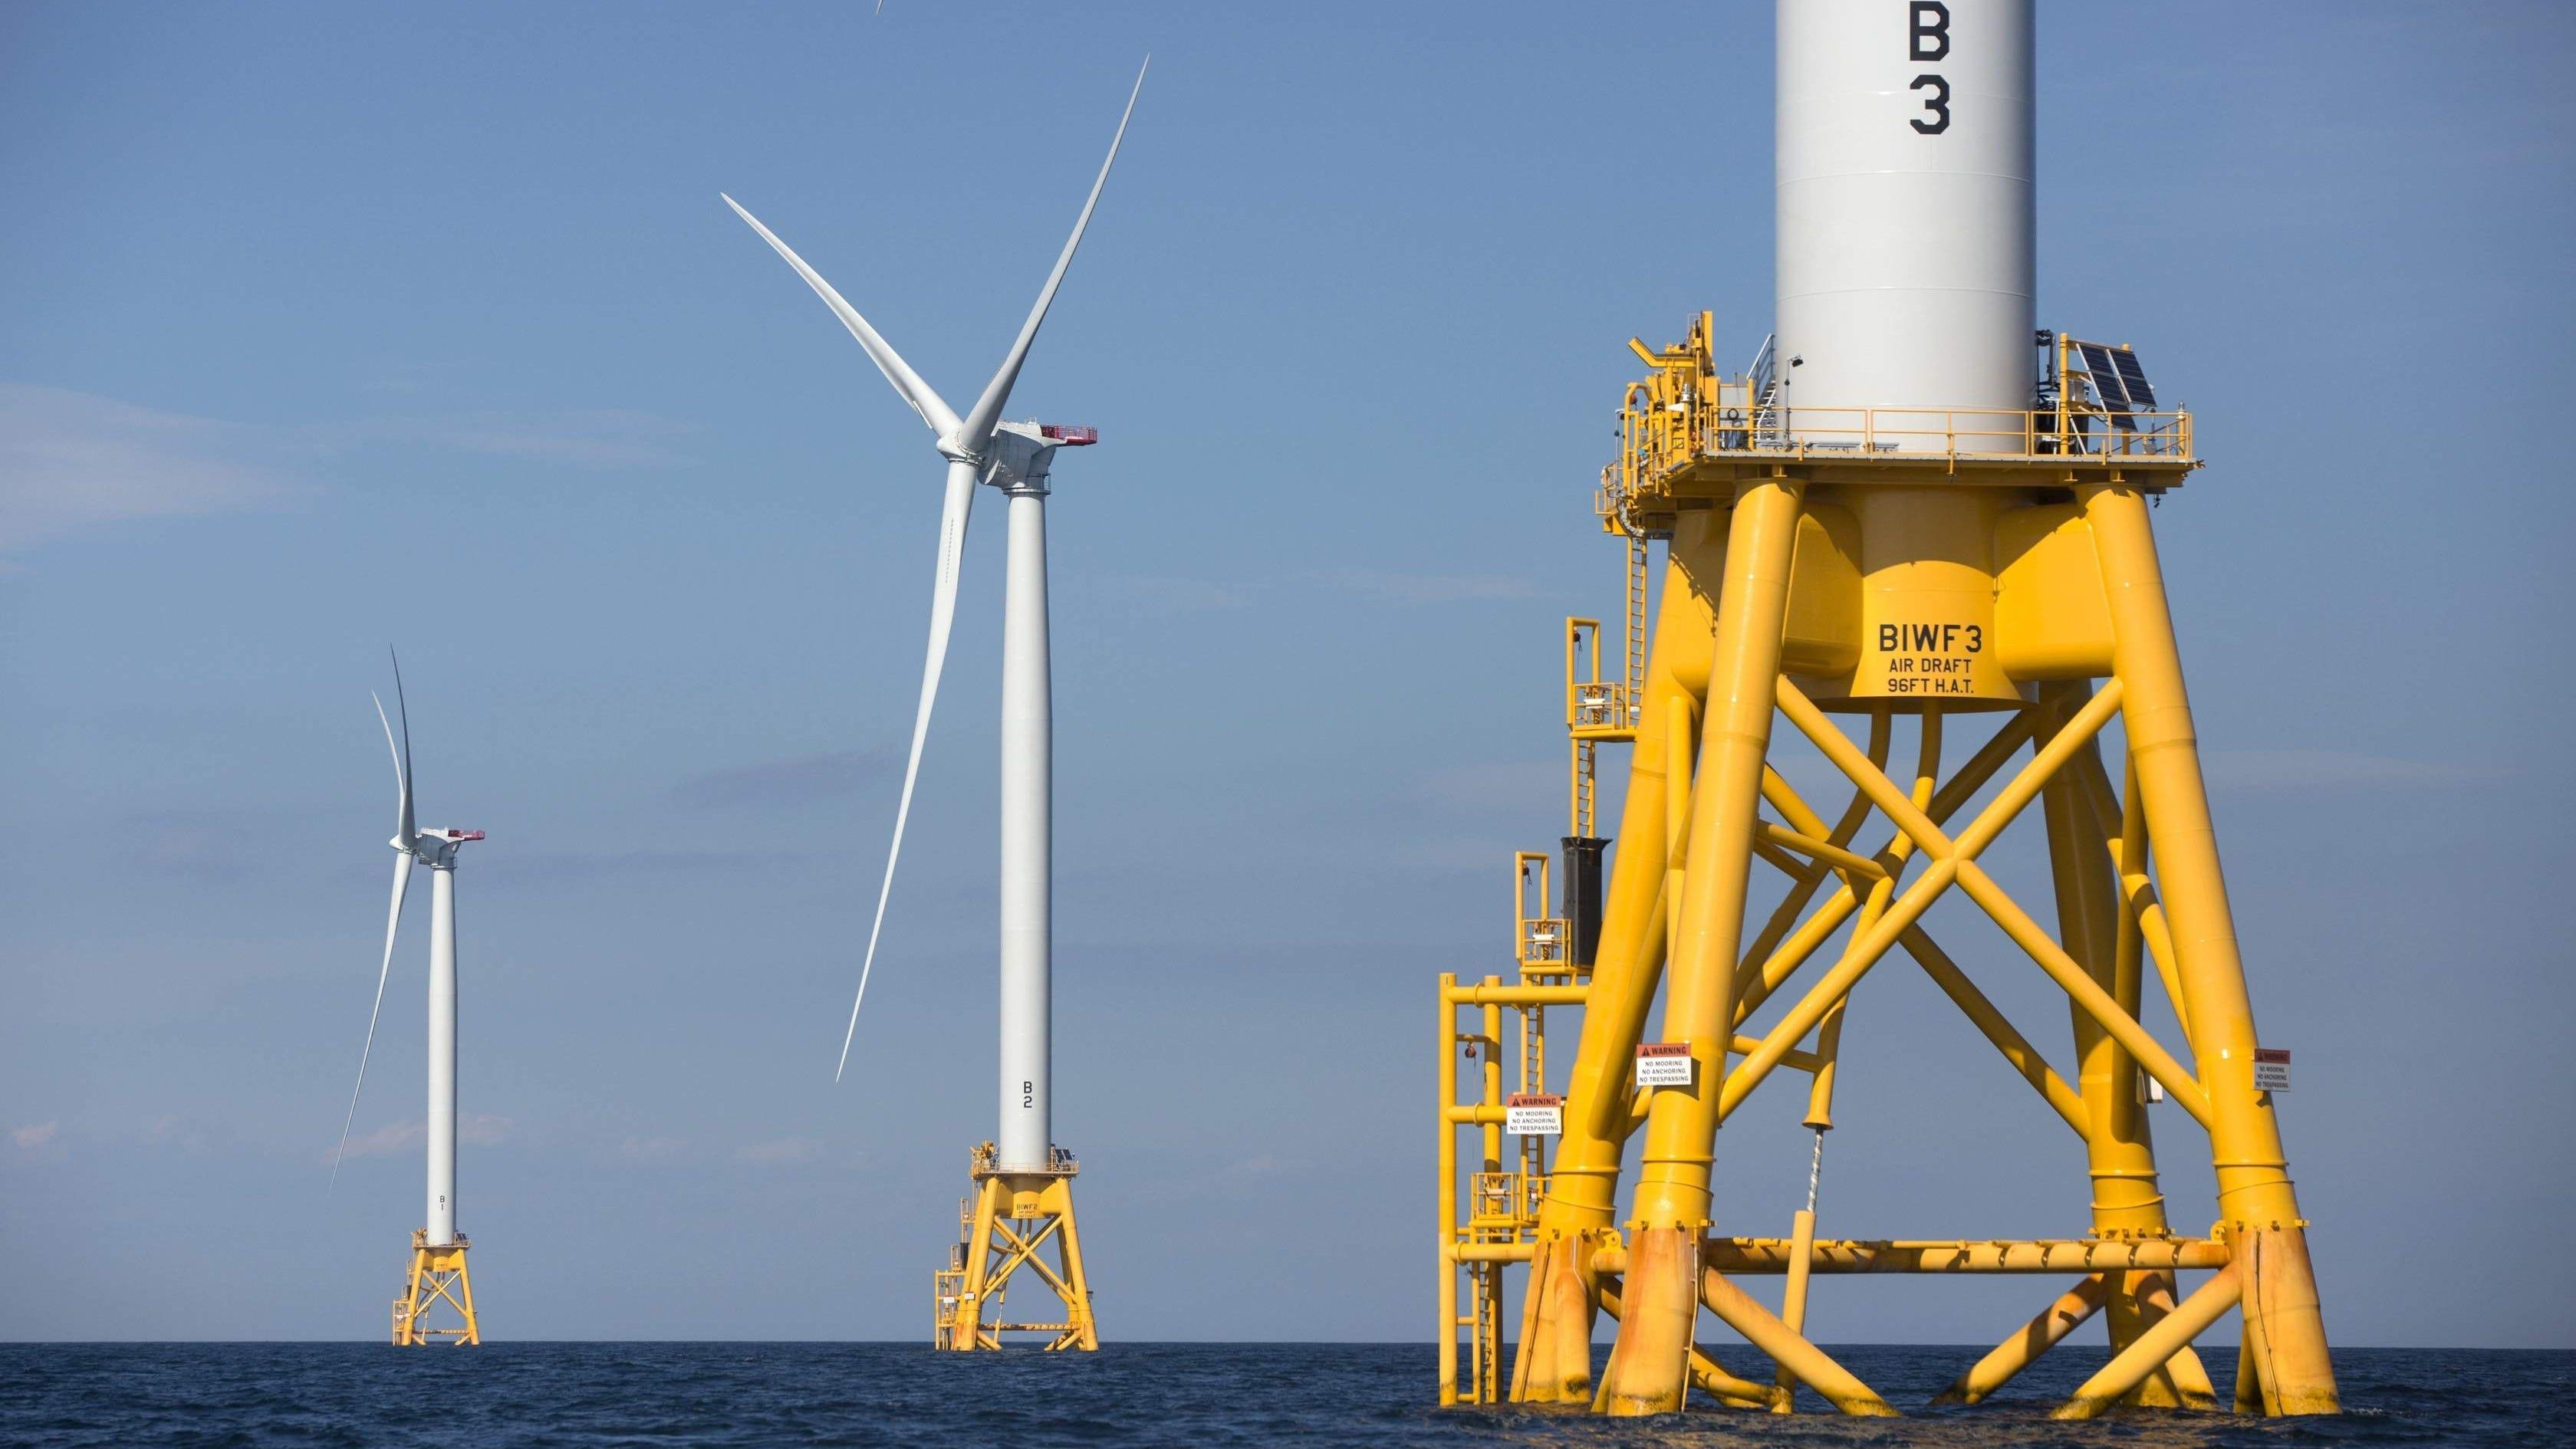 NH offshore wind energy development